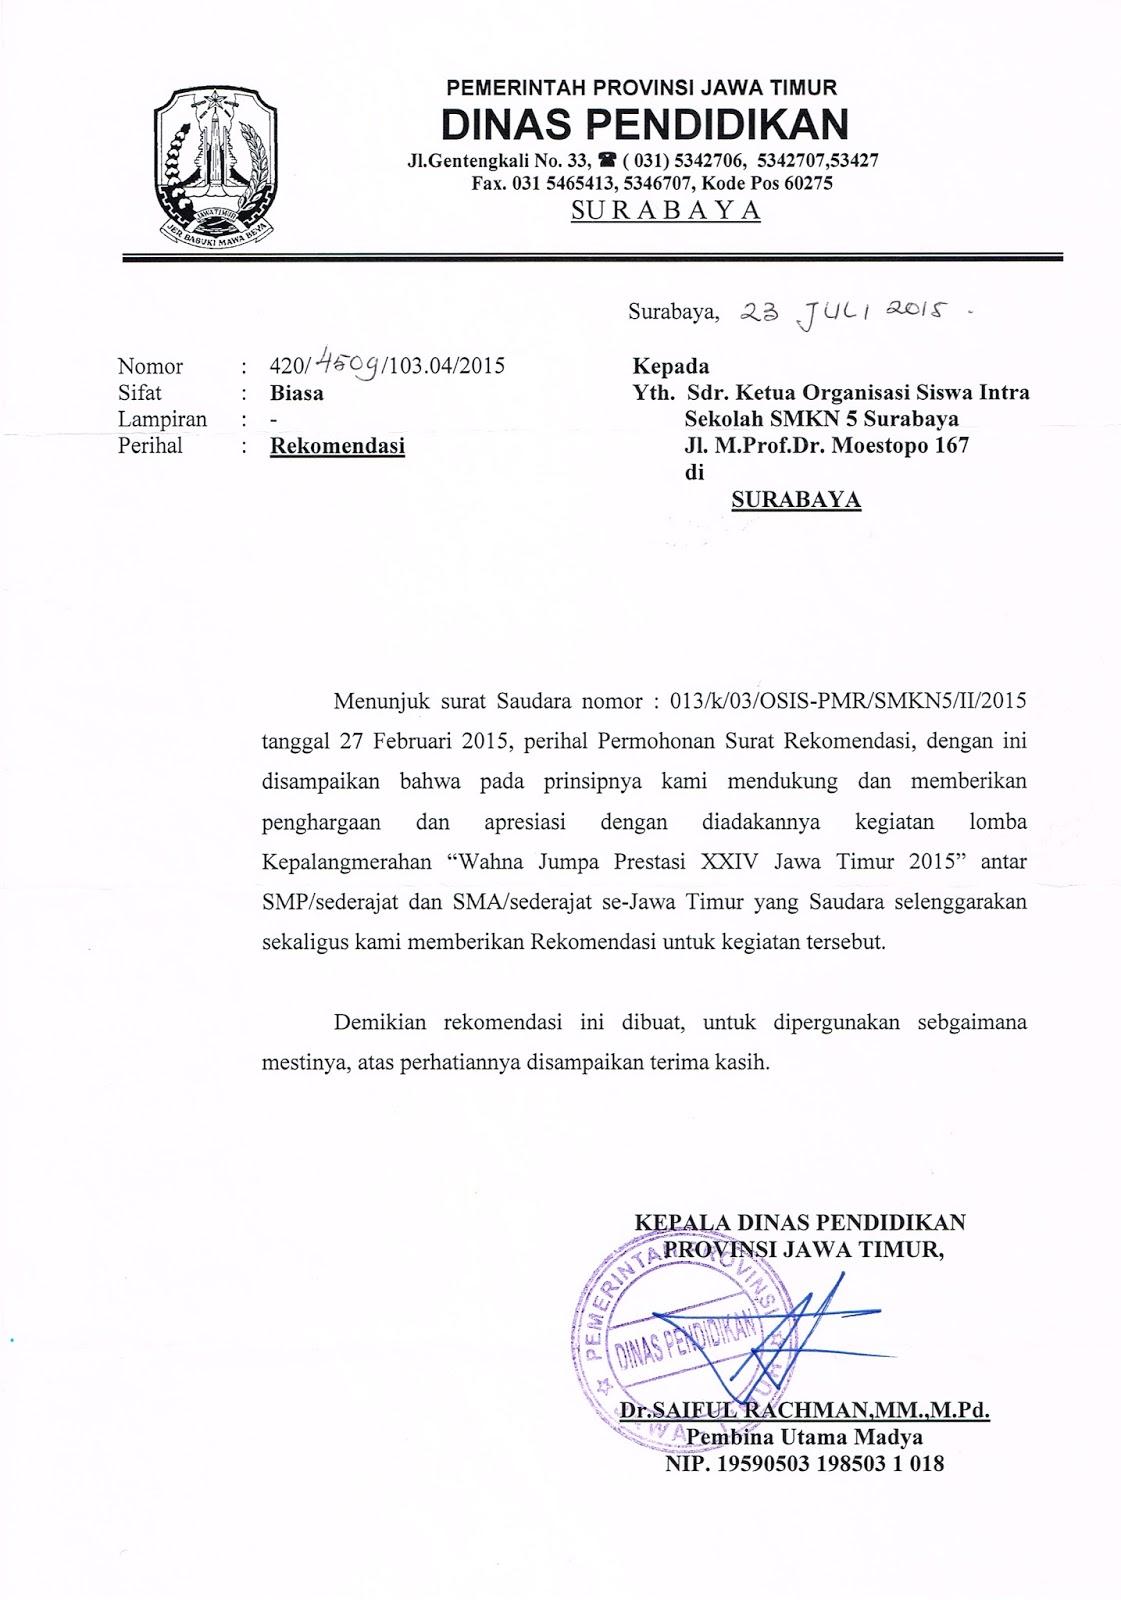 Rekomendasi Dinas Pendidikan Provinsi Jawa Timur Pmr Smk Negeri 5